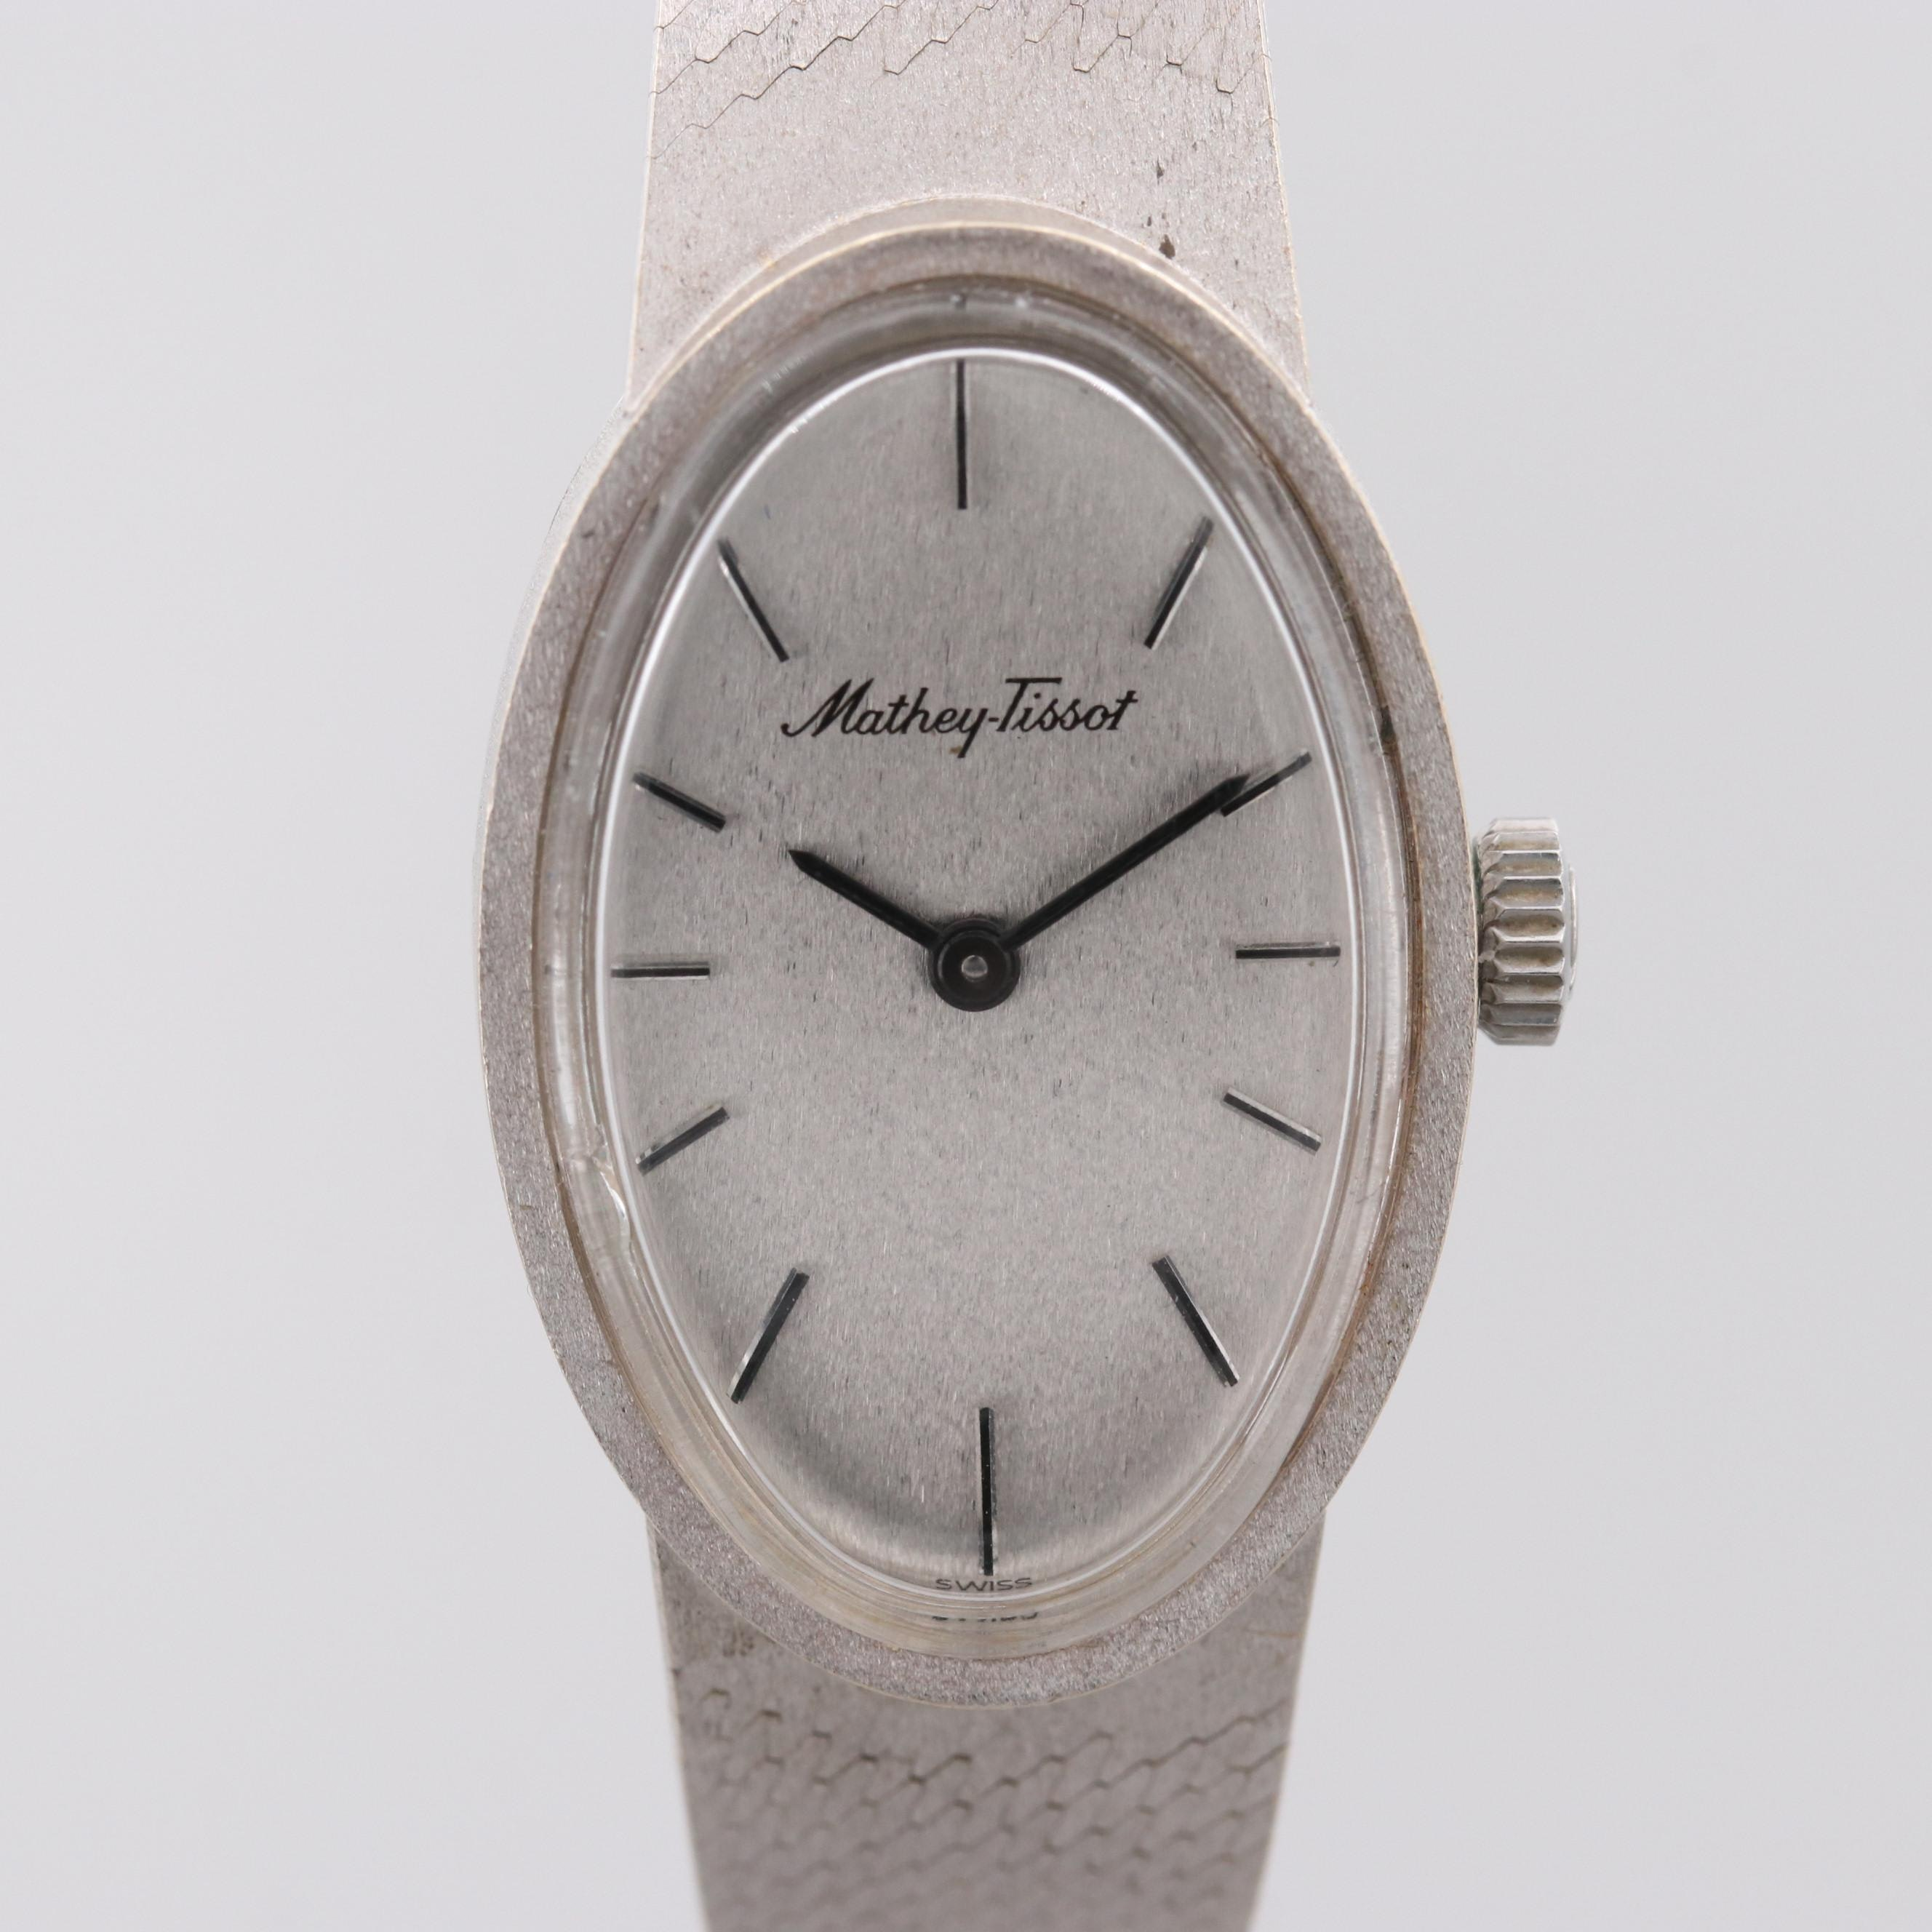 Vintage Mathey-Tissot Grand Prix 18K White Gold Stem Wind Wristwatch